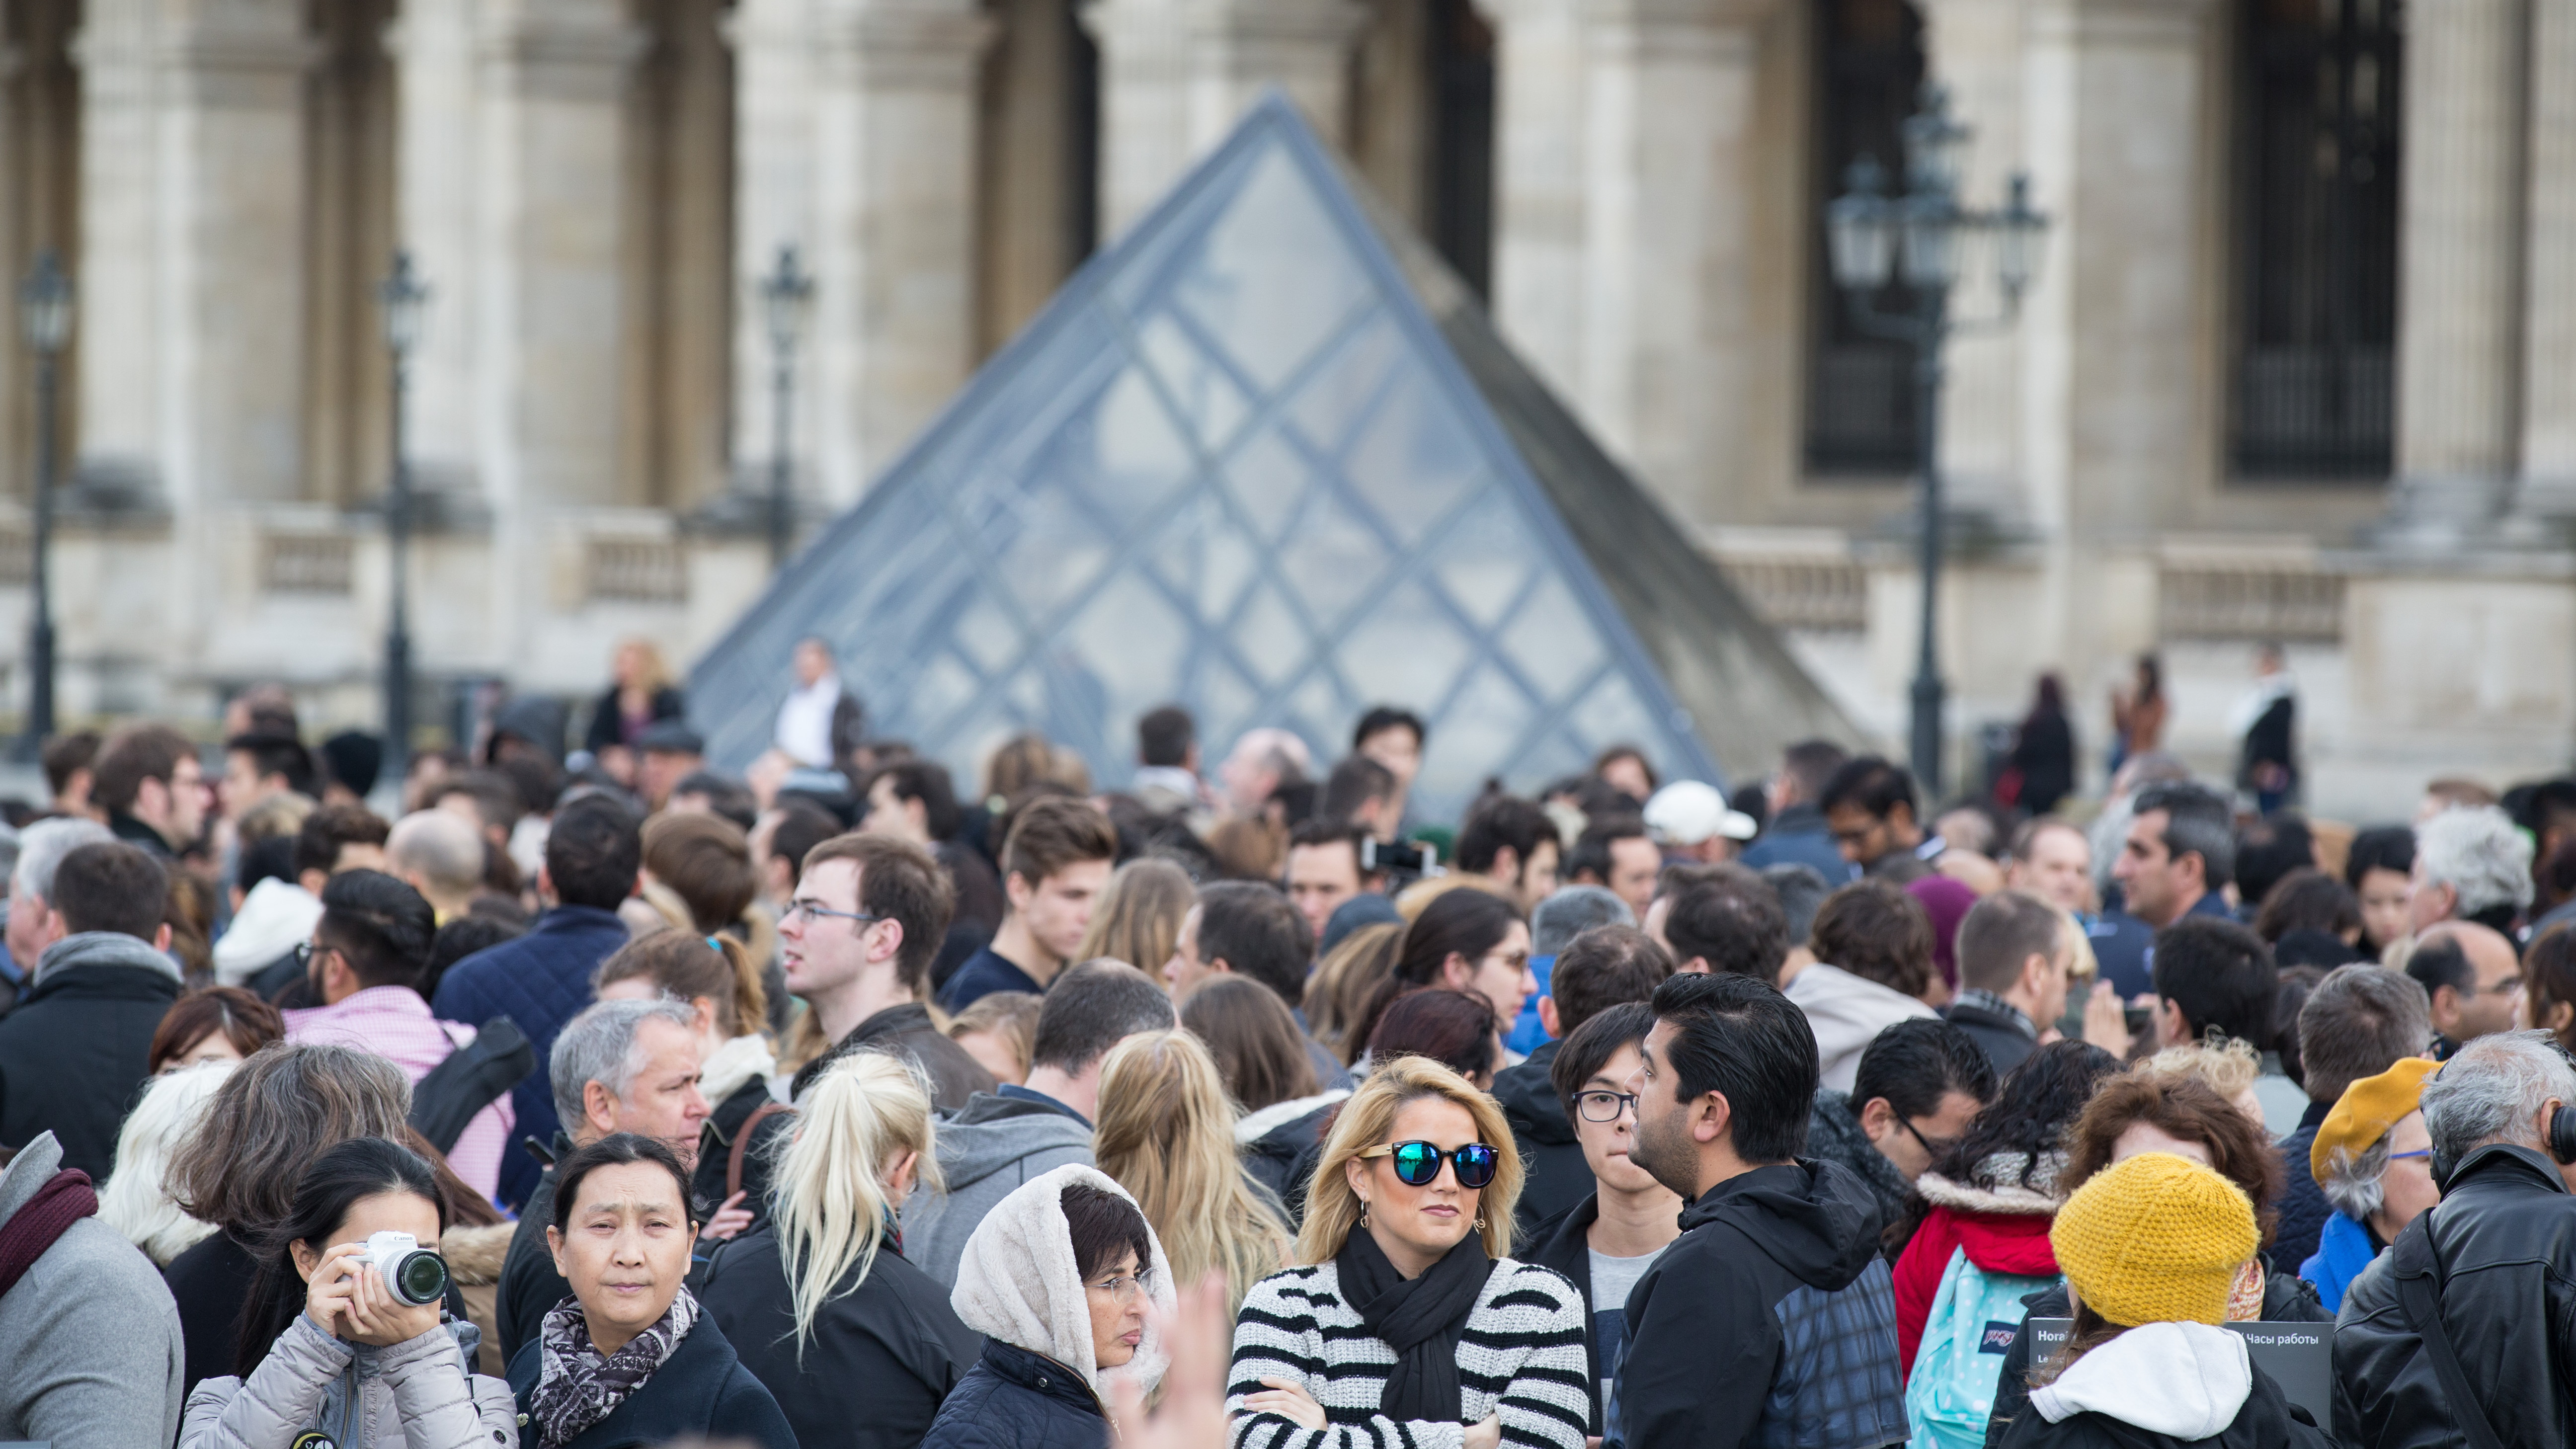 Paris Attacks Create A Dilemma For Travelers